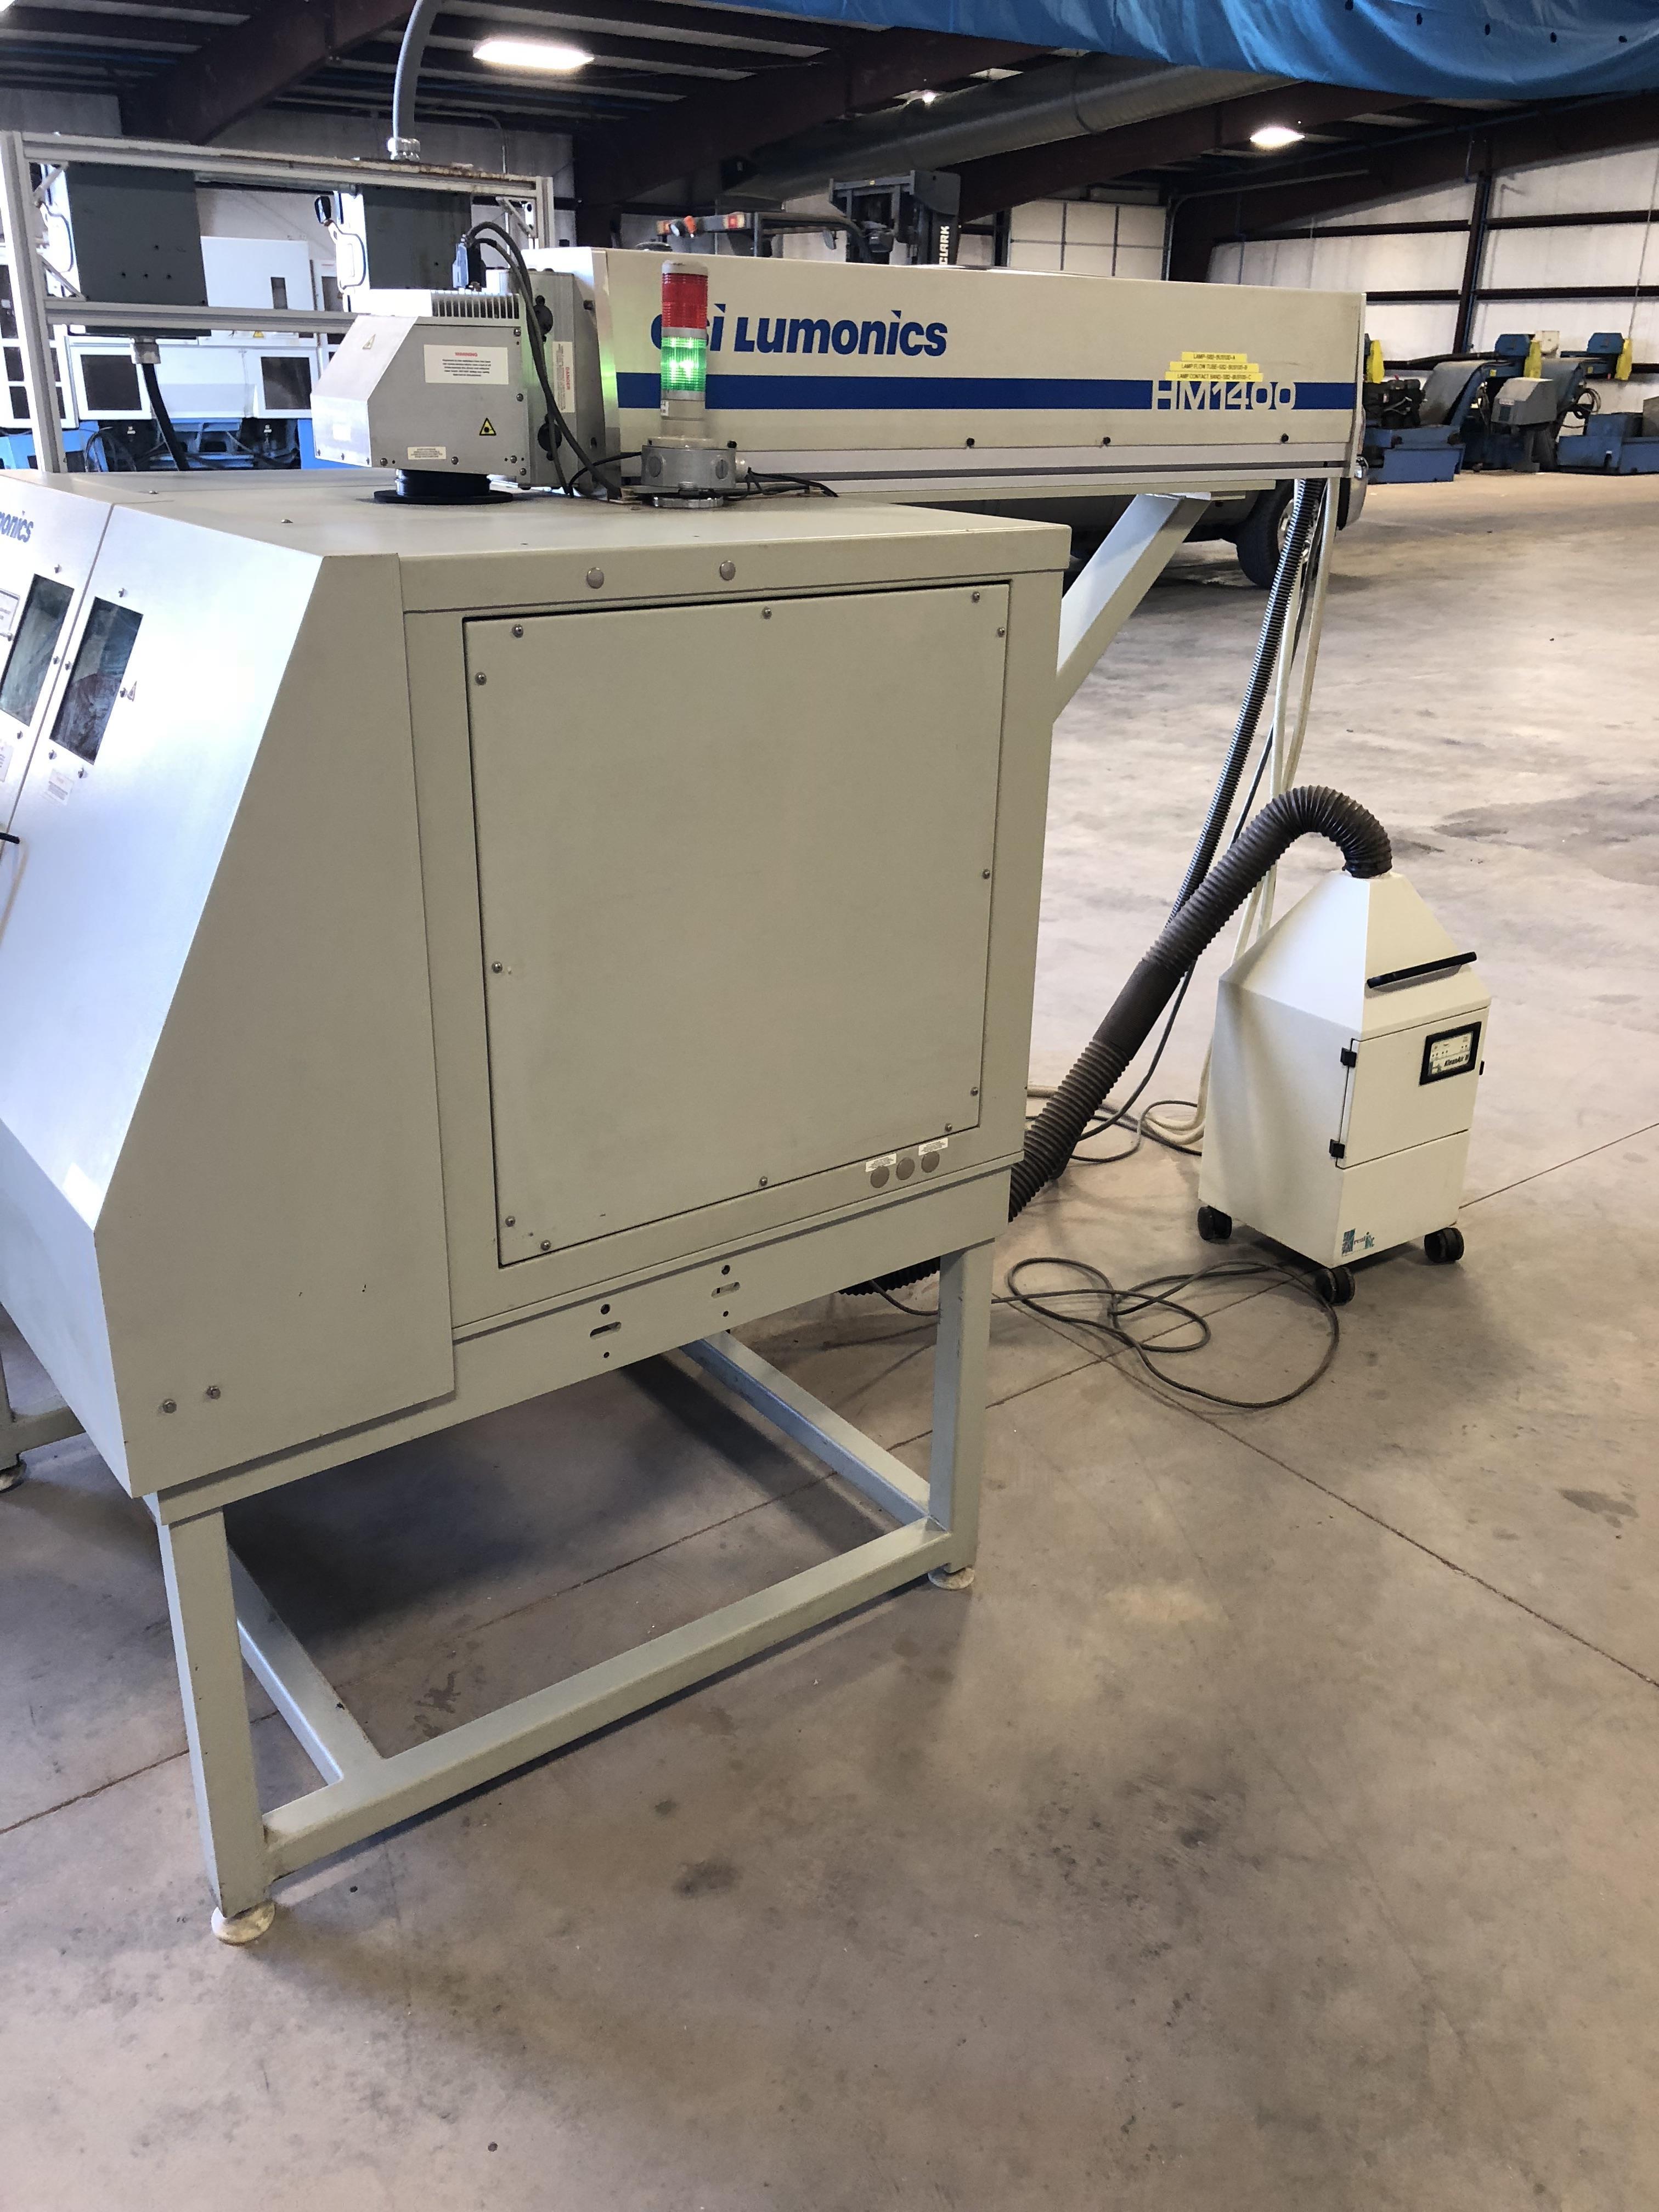 GSI Lumonics HM1400 Laser Marker w/YAG T818/FS/CE Laser, LPS 30 CCS Power Supply 100 watt, - Image 2 of 10